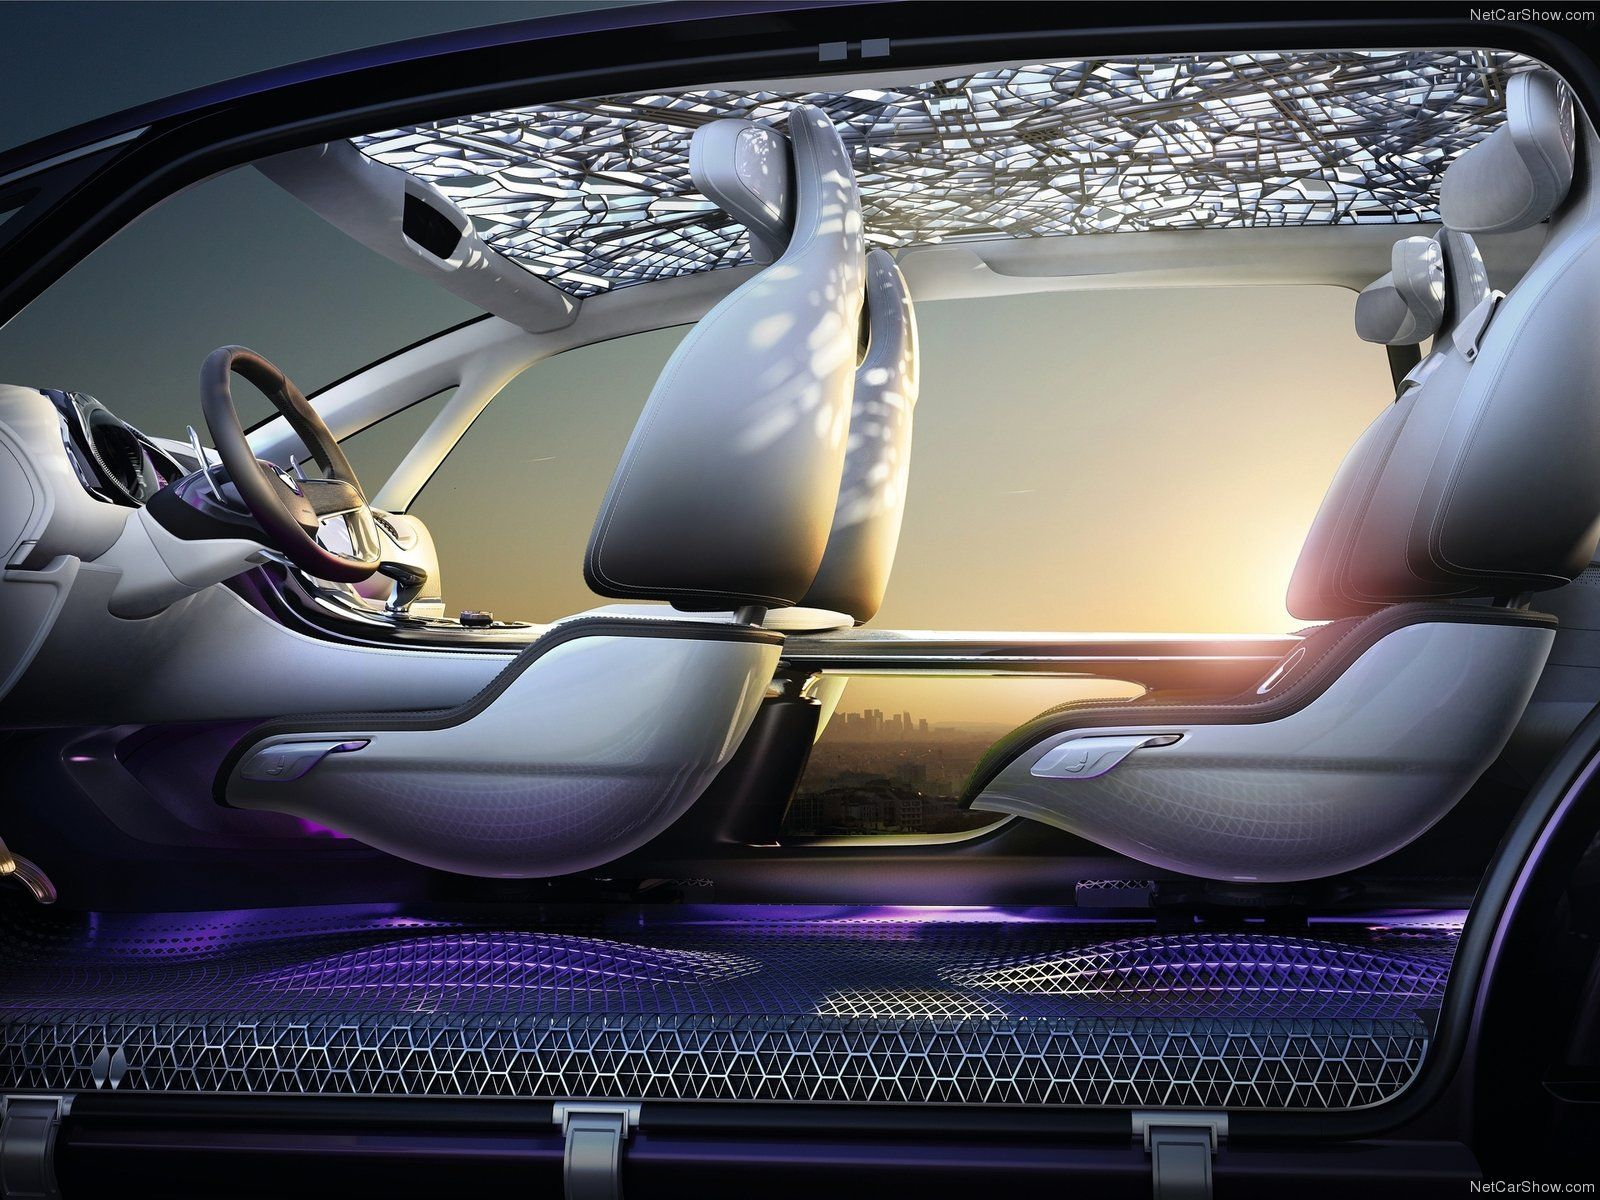 renault interior french paris car seat future glass